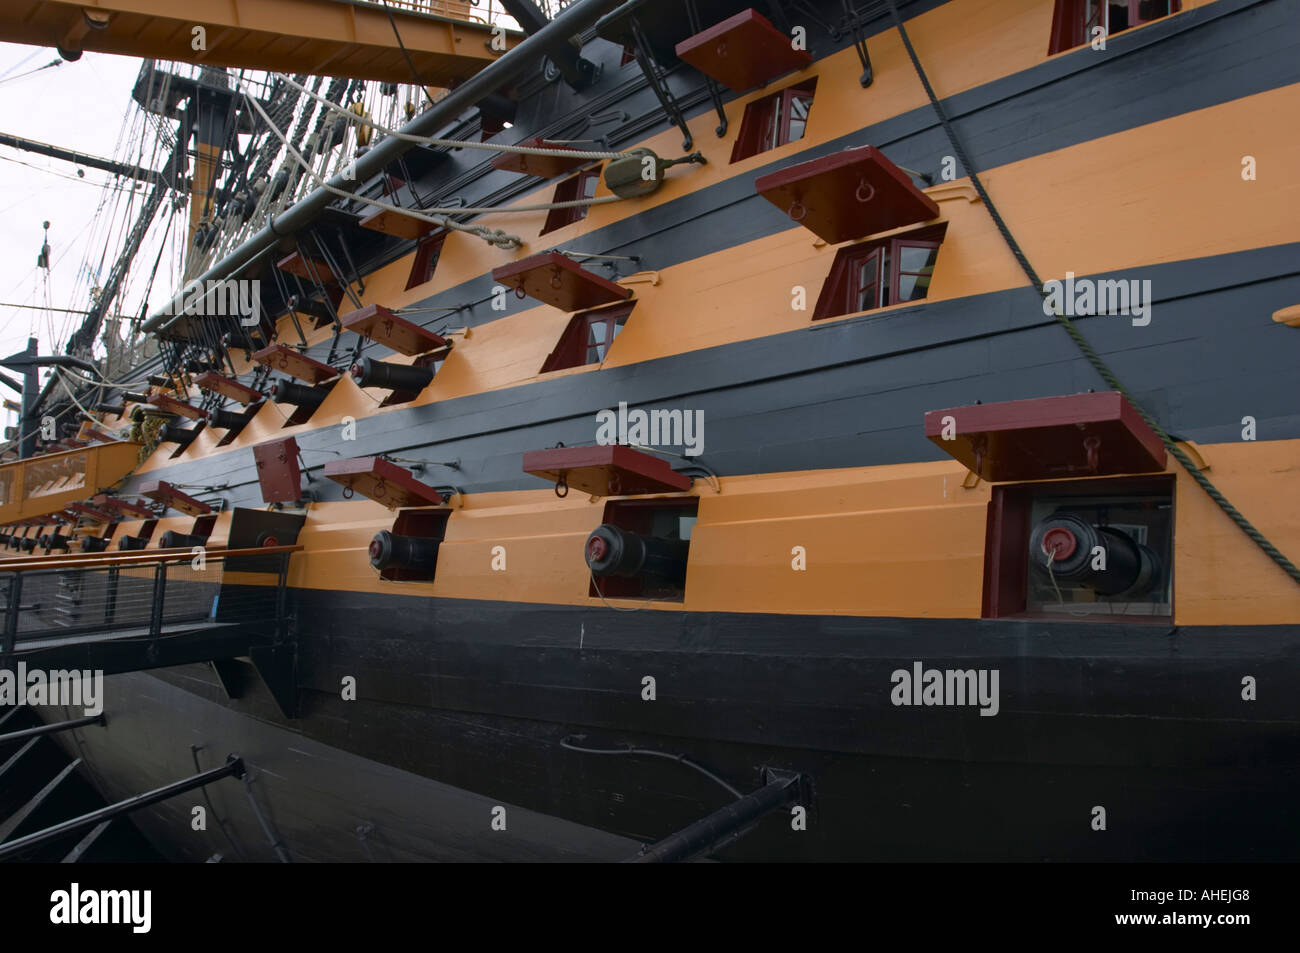 HMS Victory at Portsmouth Historic Dockyard, Hampshire, England - Stock Image